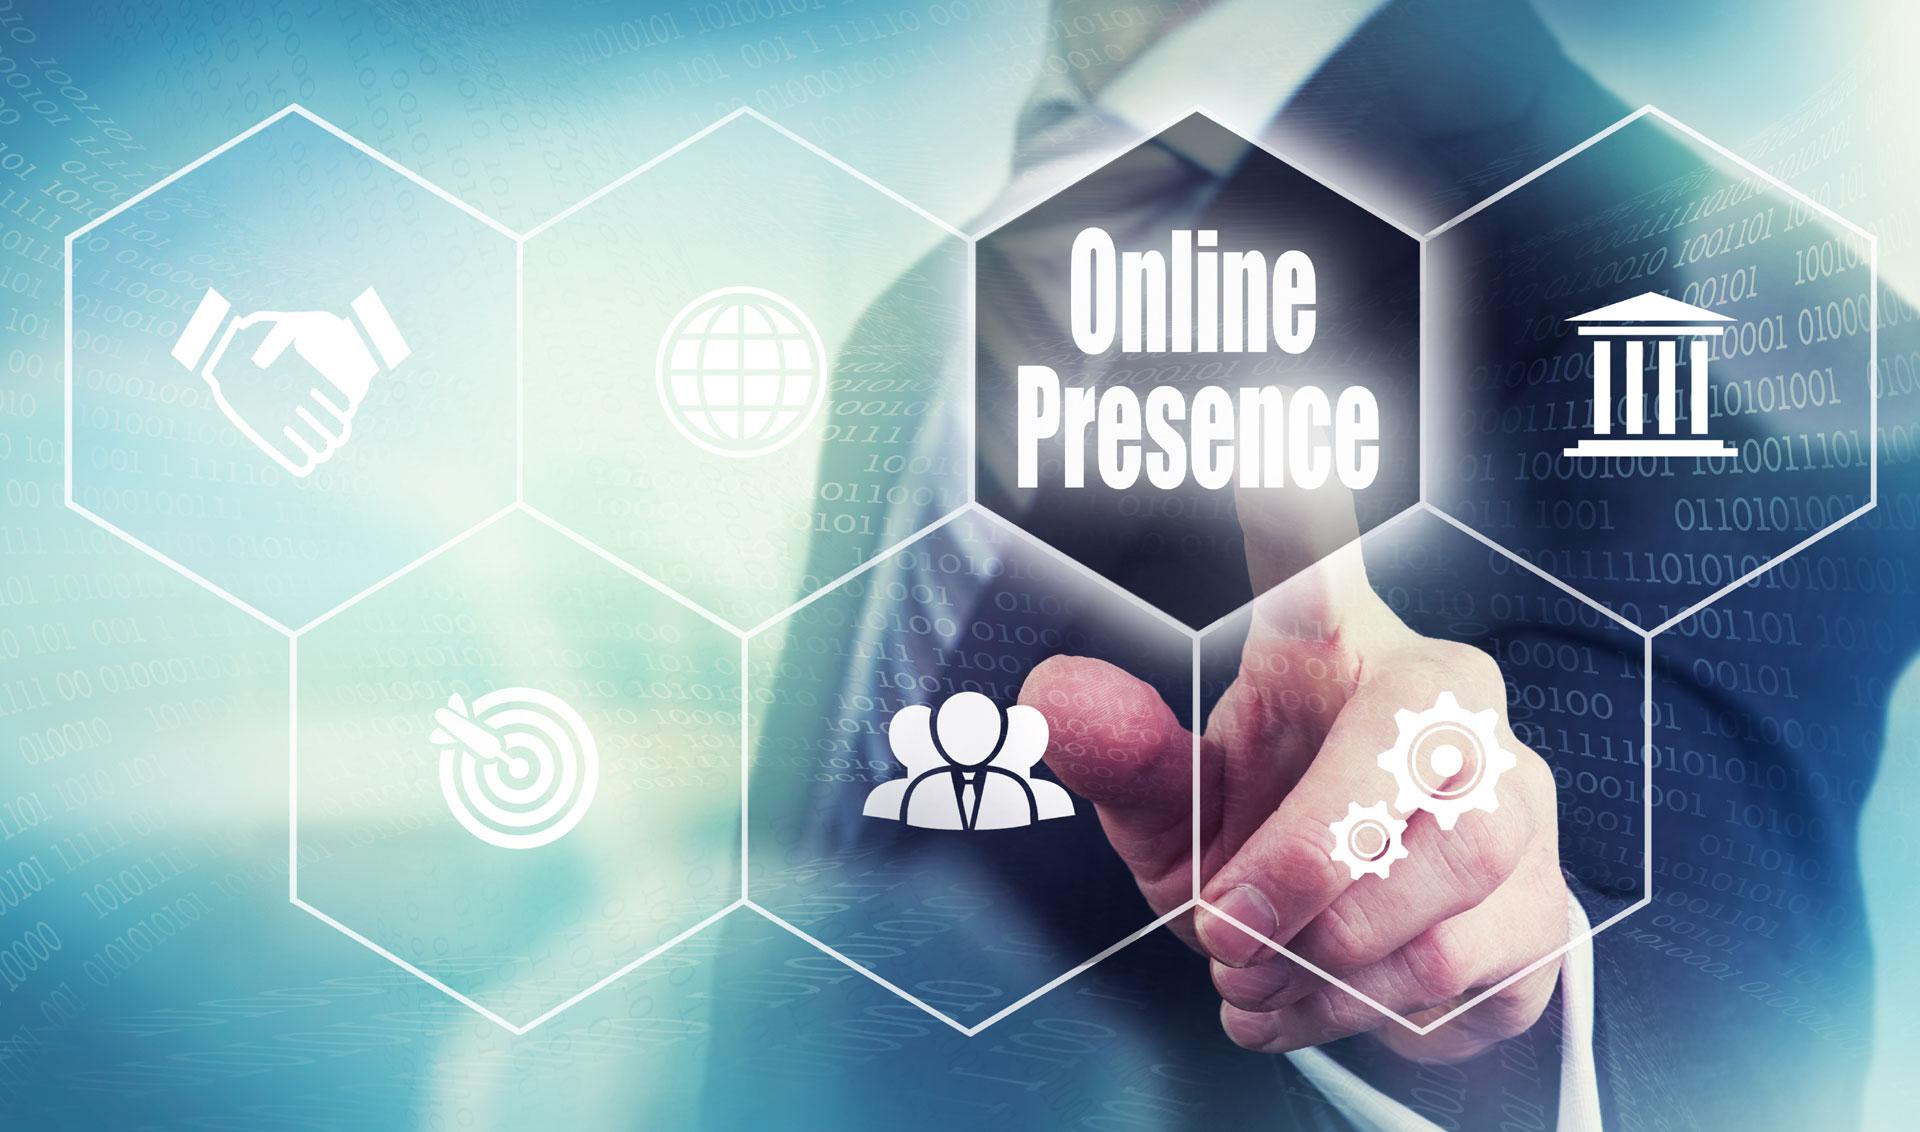 natlive online presence